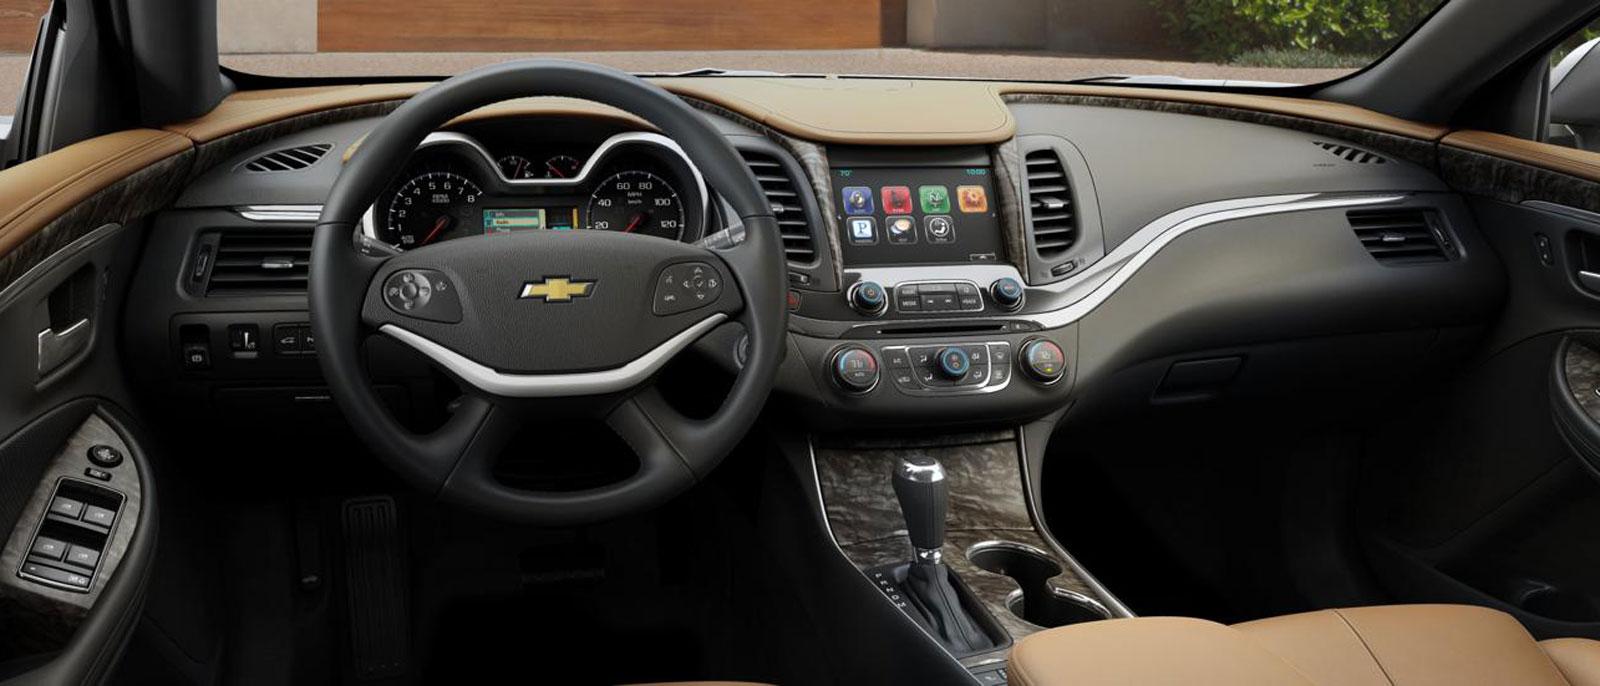 2015 Impala; 2015 Impala; 2015 Impala ...